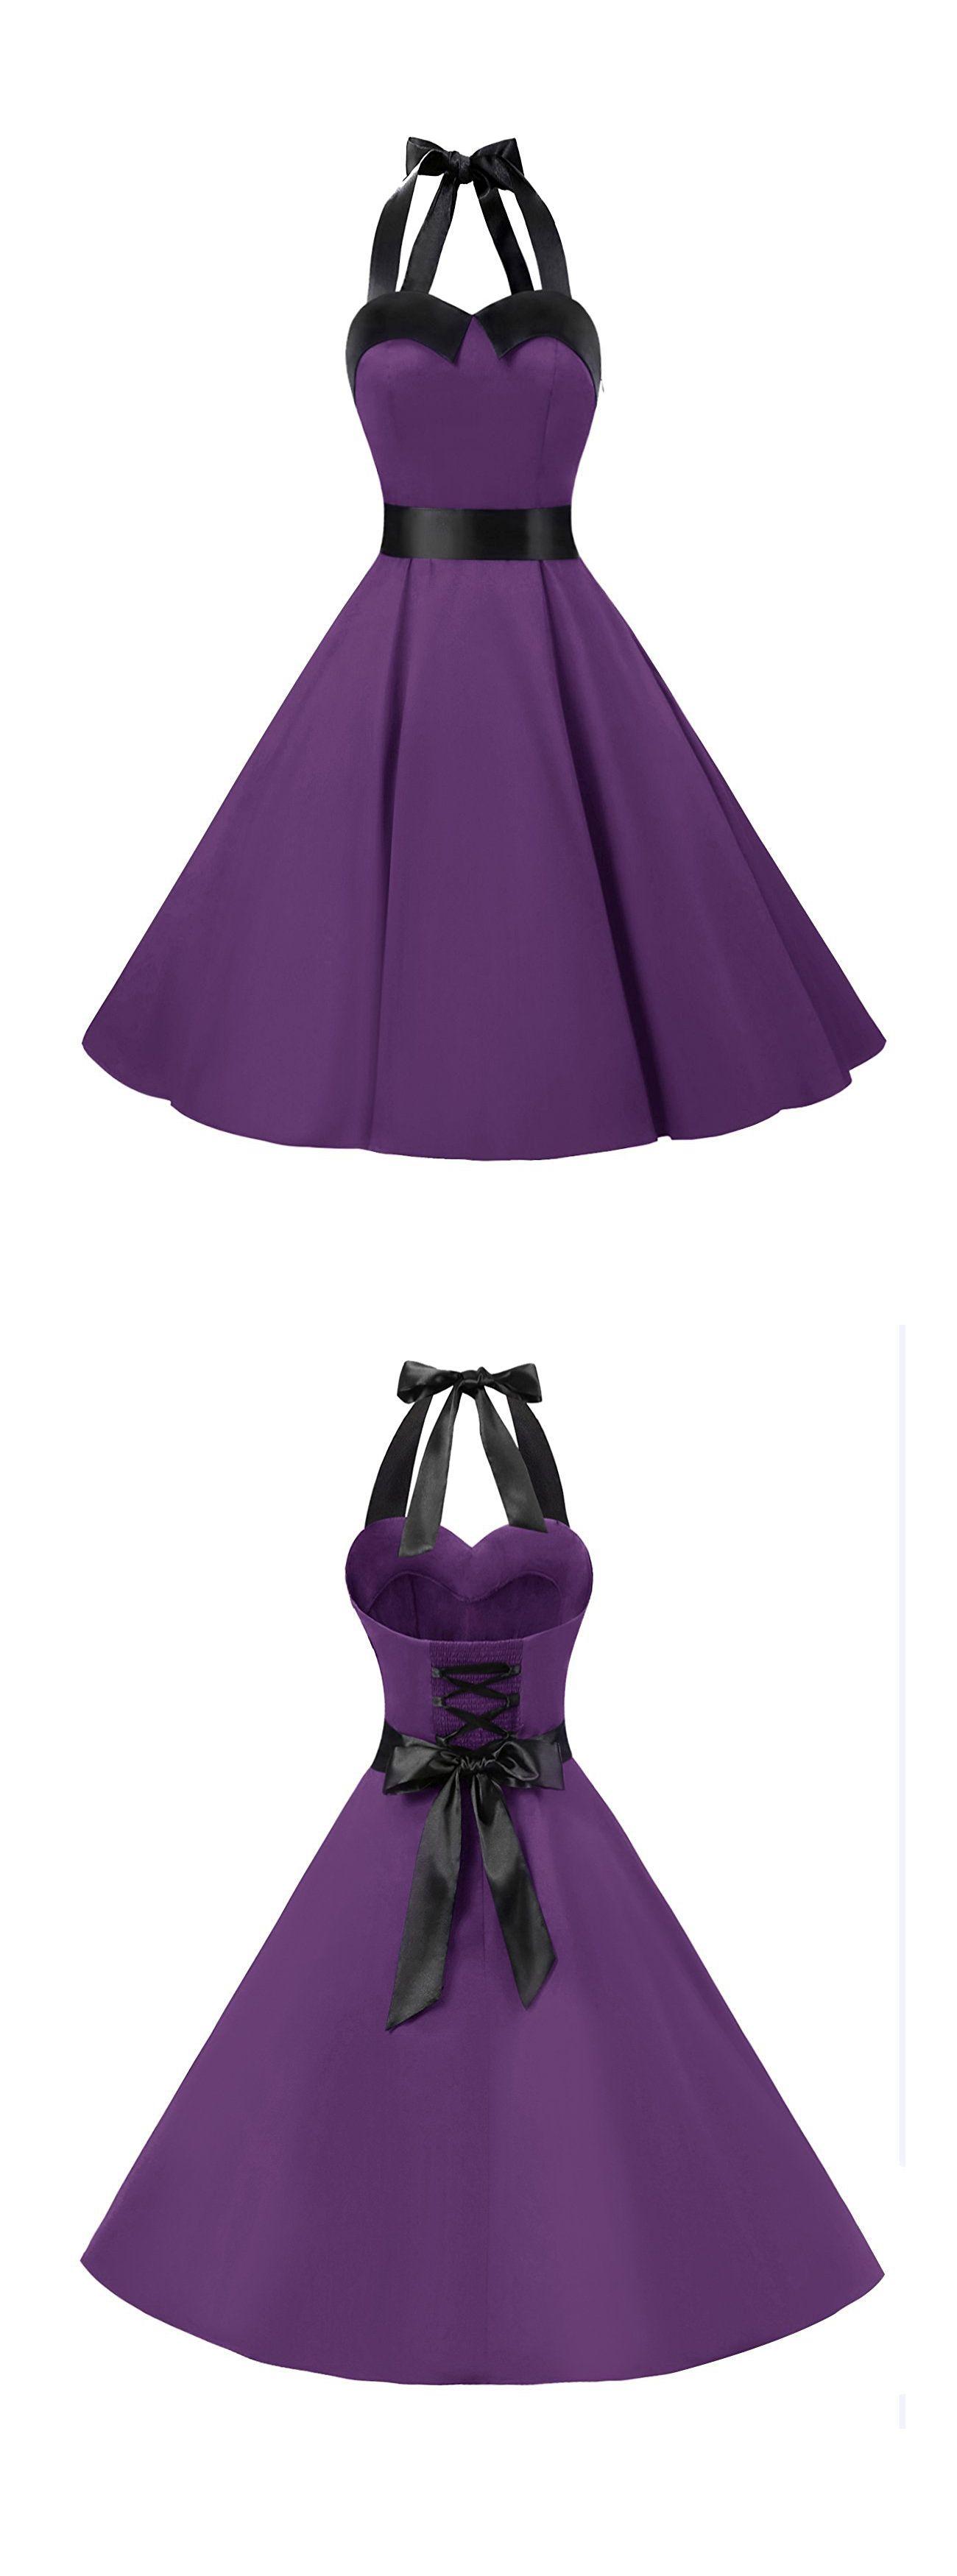 50s Retro Style Halter Grape Vintage Ruched Retro Party Dress ...